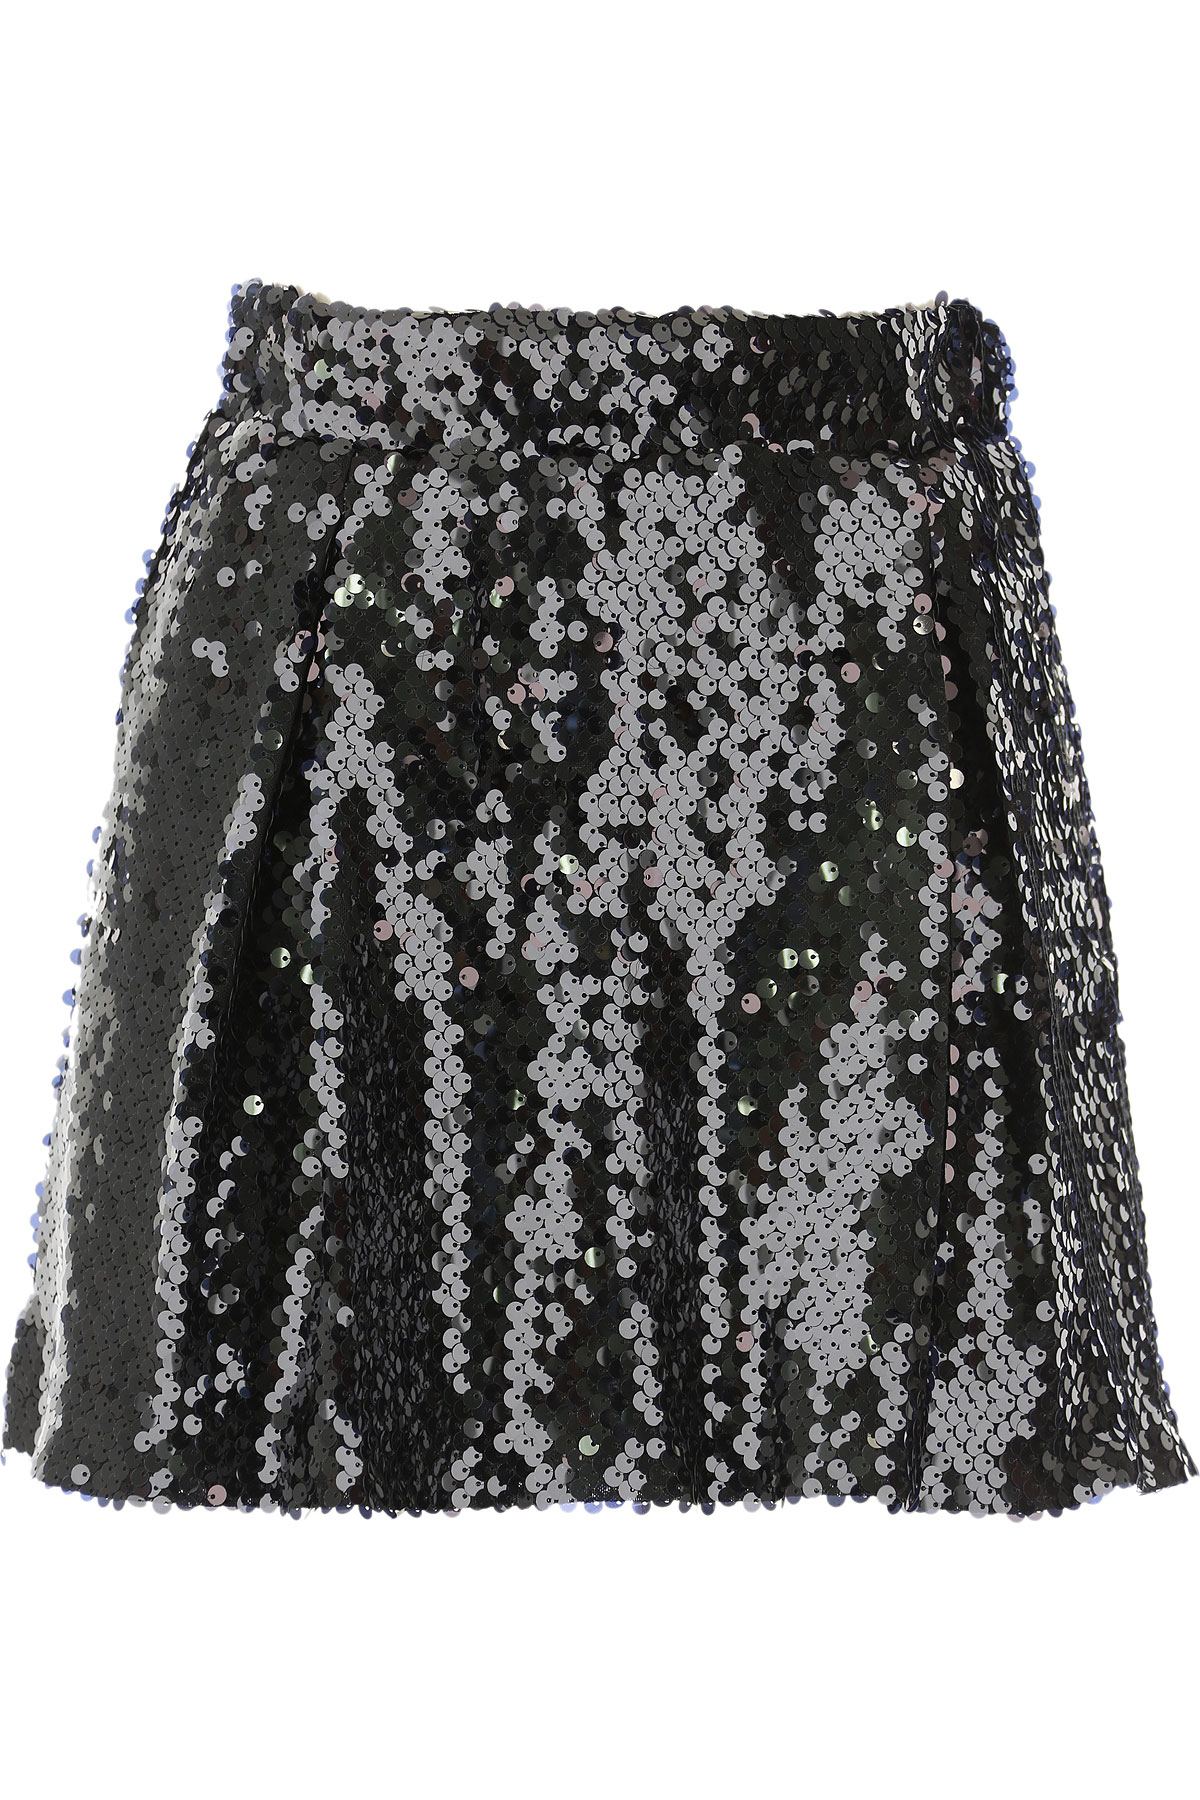 Aniye By Skirt for Women On Sale, Black, polyamide, 2019, 2 4 6